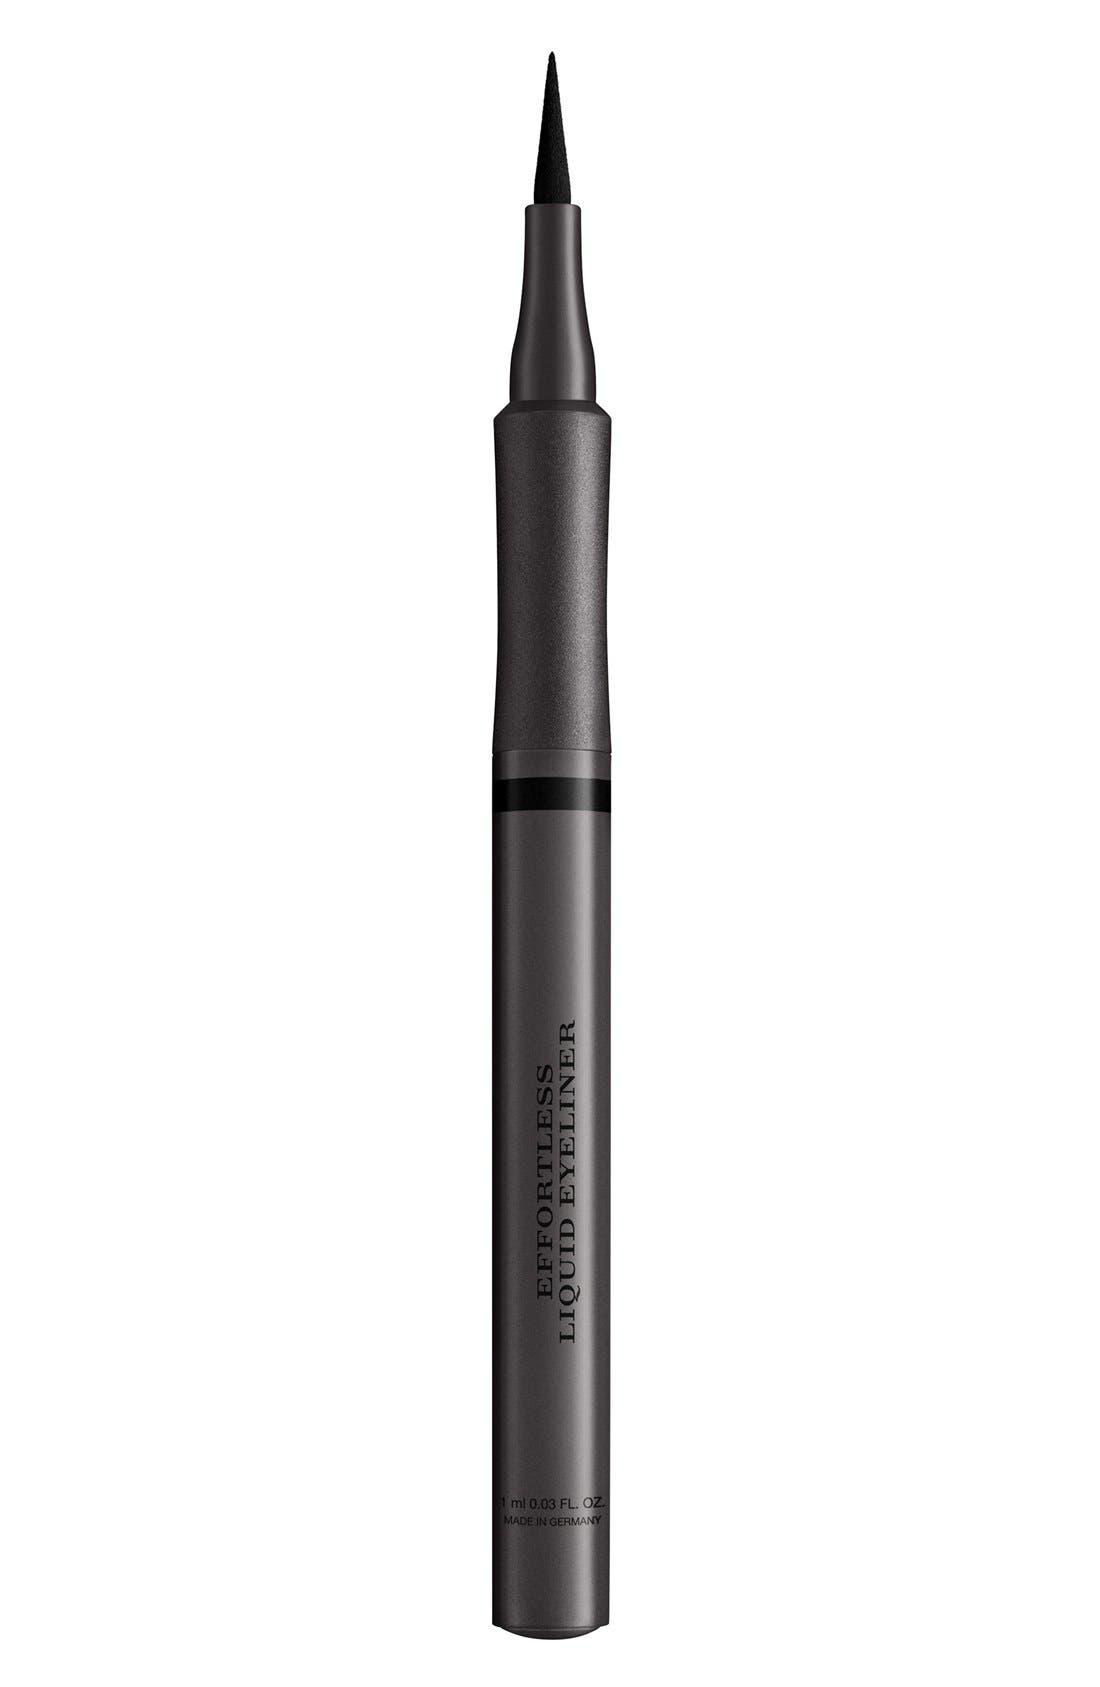 Burberry Effortless Liquid Eyeliner,                         Main,                         color, 200